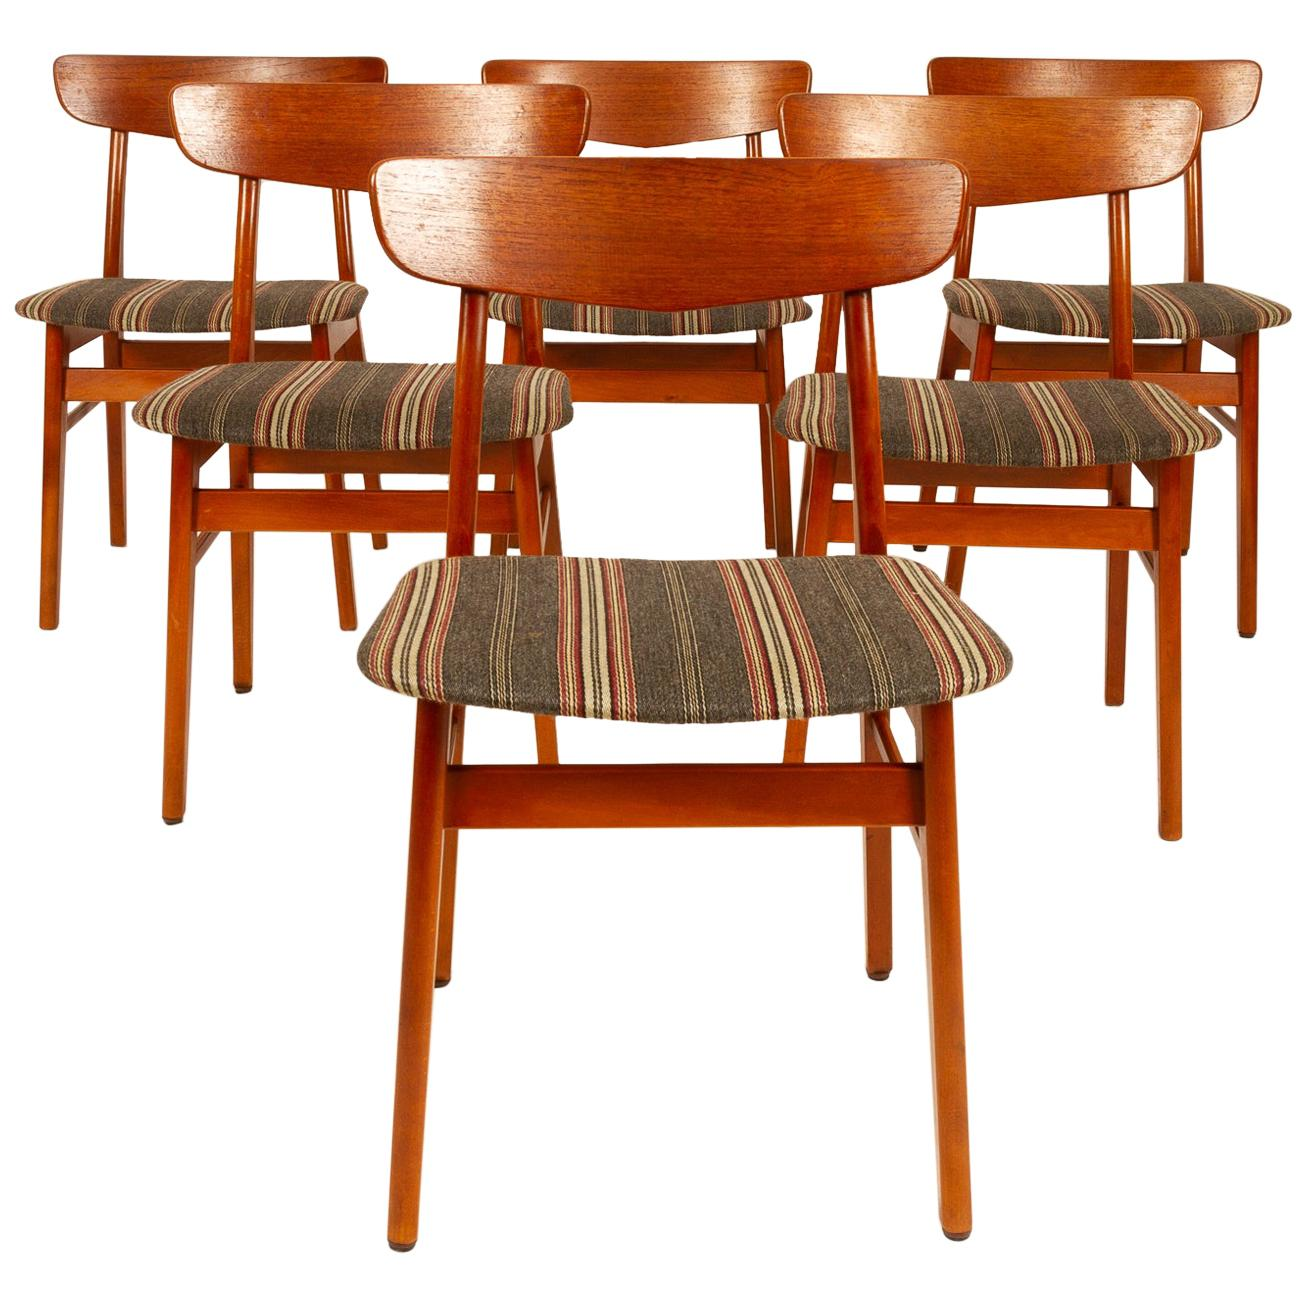 Vintage Danish Teak Dining Chairs 1960s Set of 6